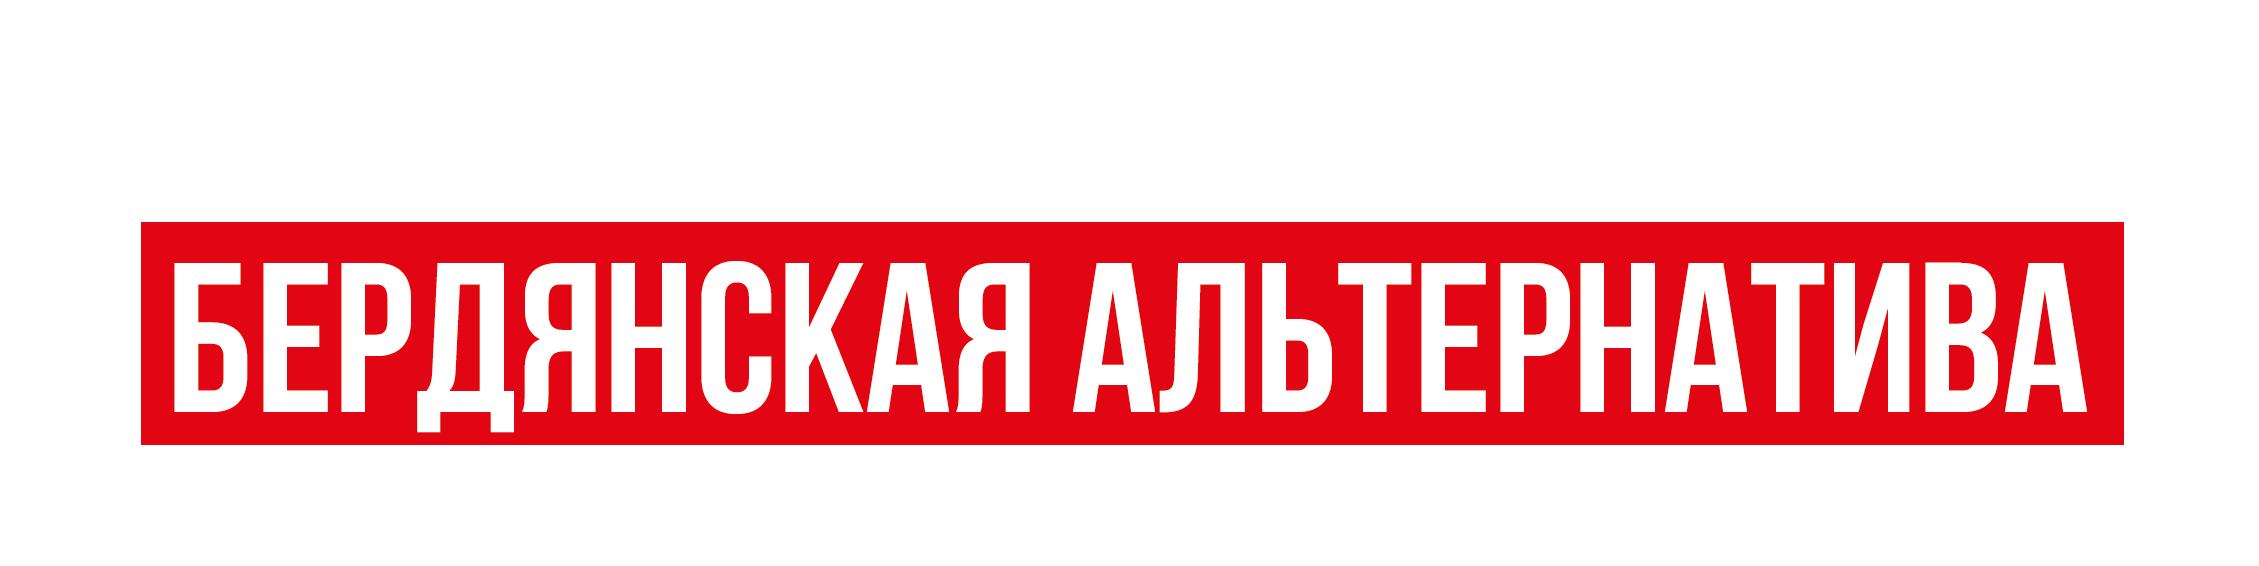 Павел Наседкин